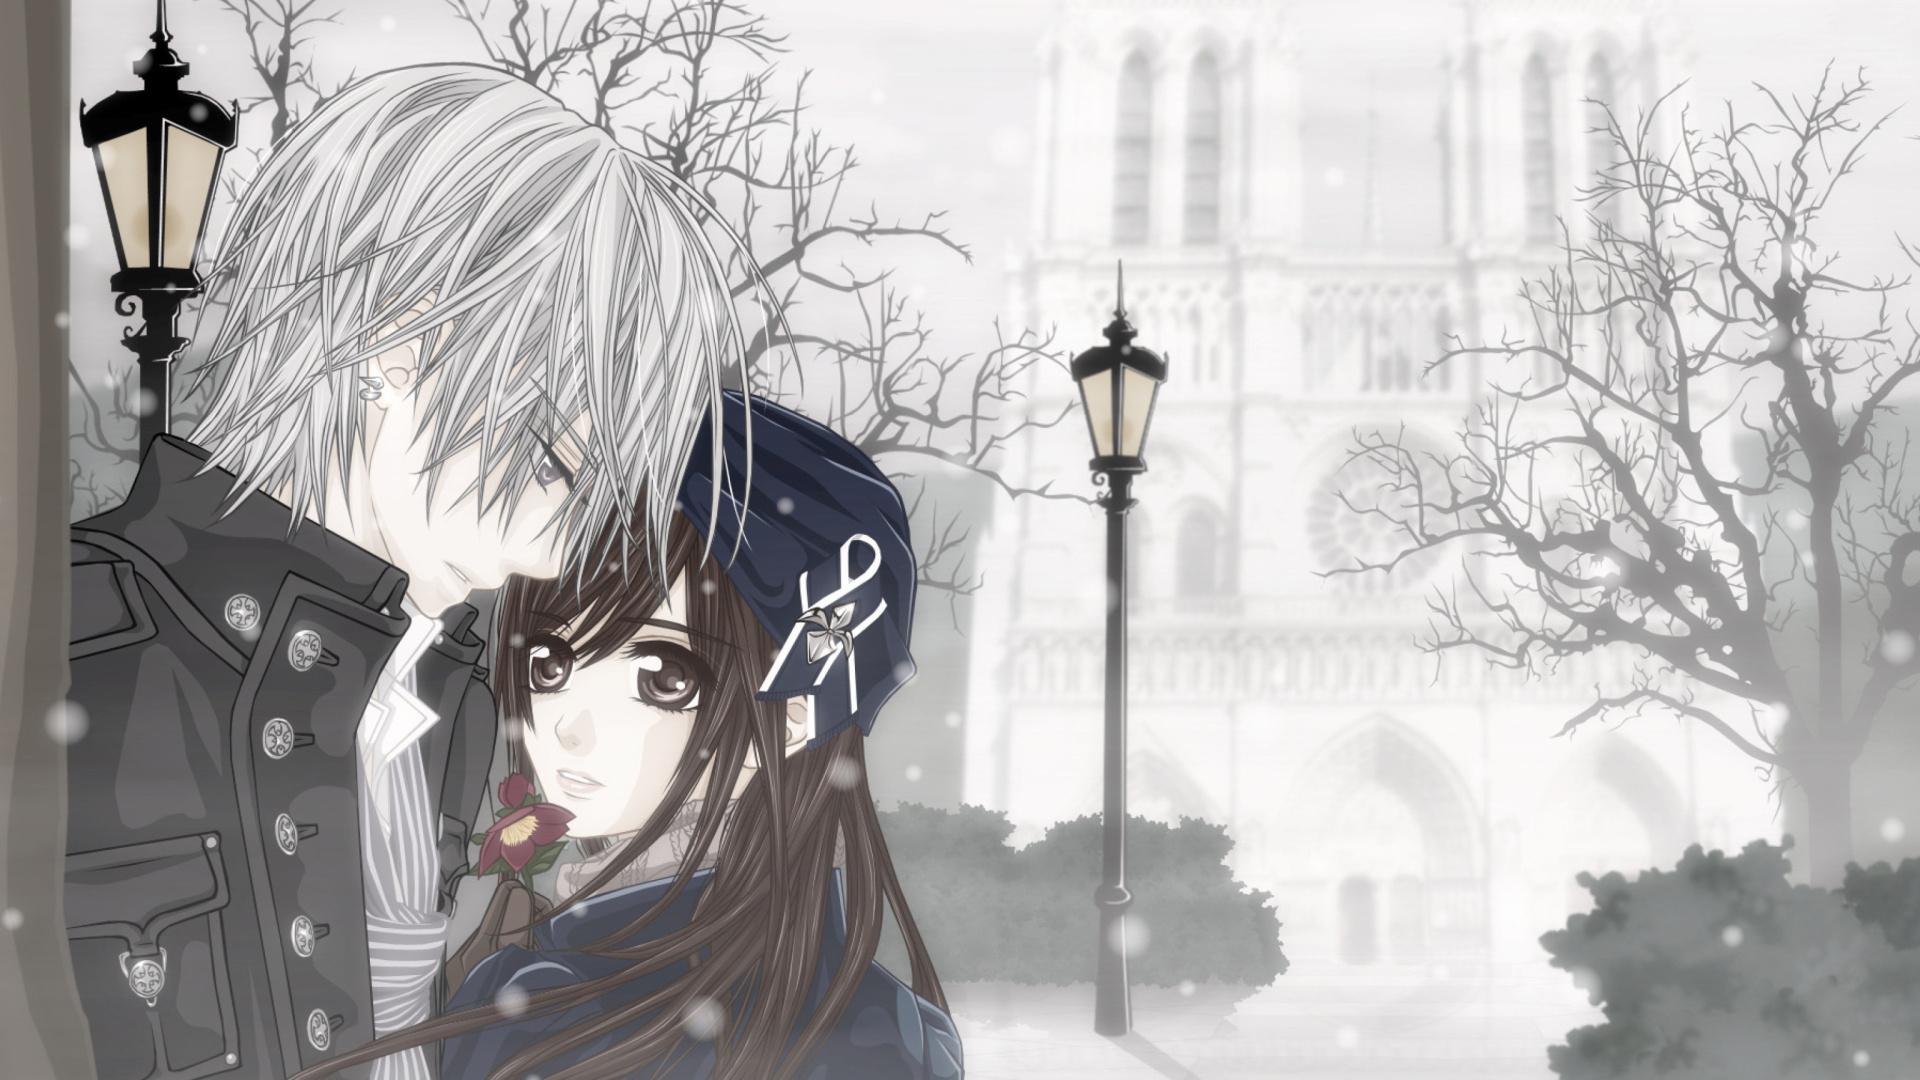 Tags Cute Anime Couple 1920x1080 wallpaper1920X1080 wallpaper 1920x1080